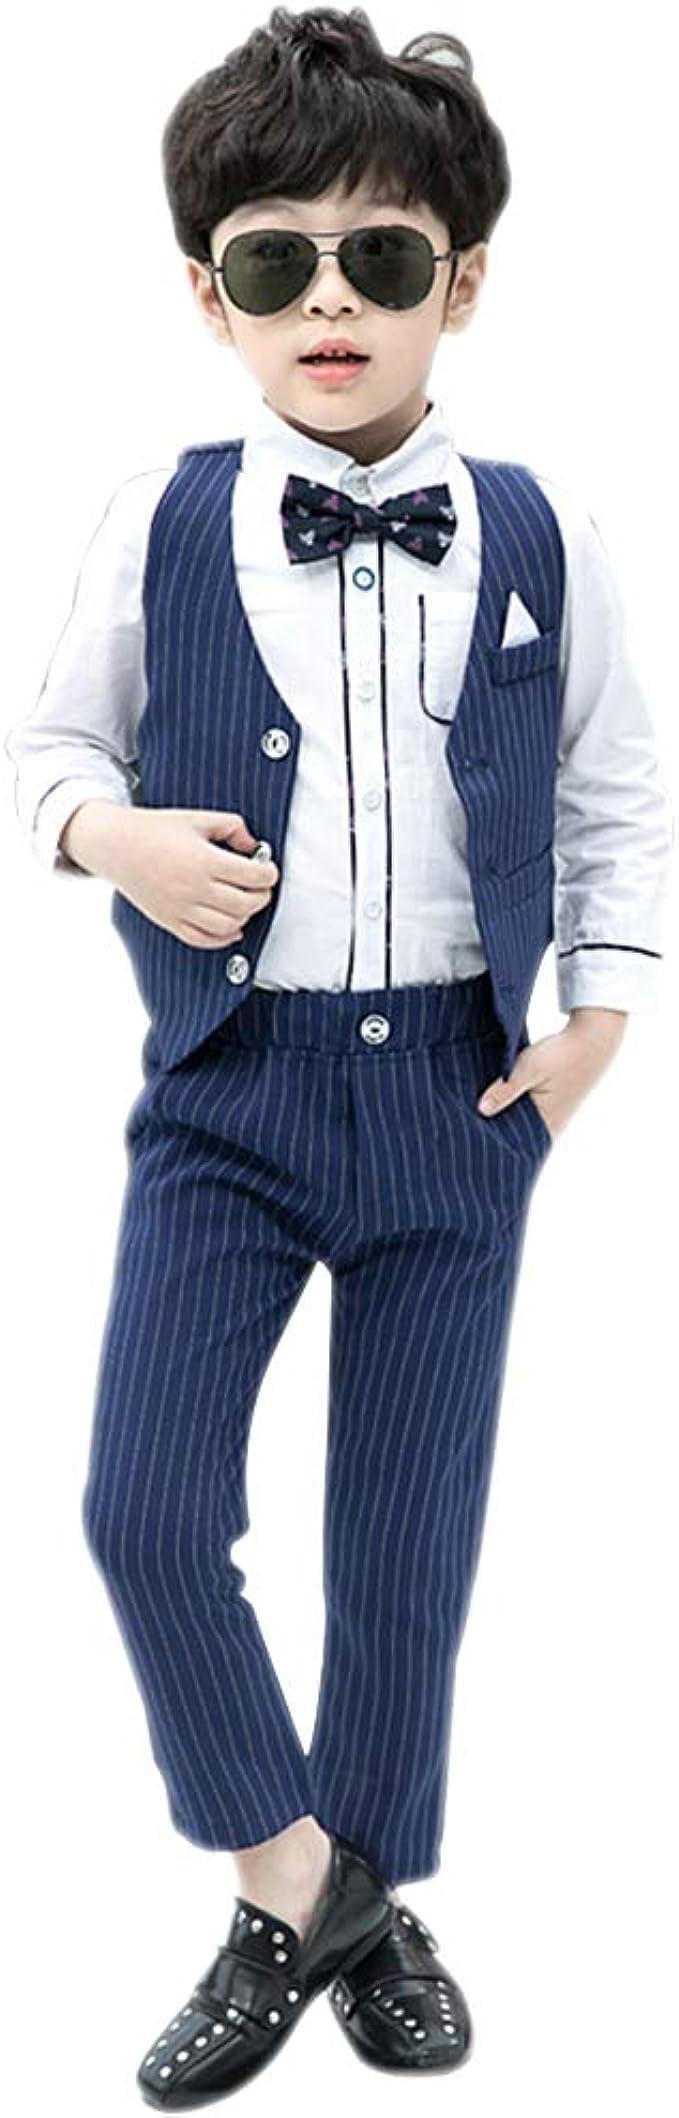 BOZEVON Kinder Jungen Anzug   Mode Kinder Bekleidungssets ...